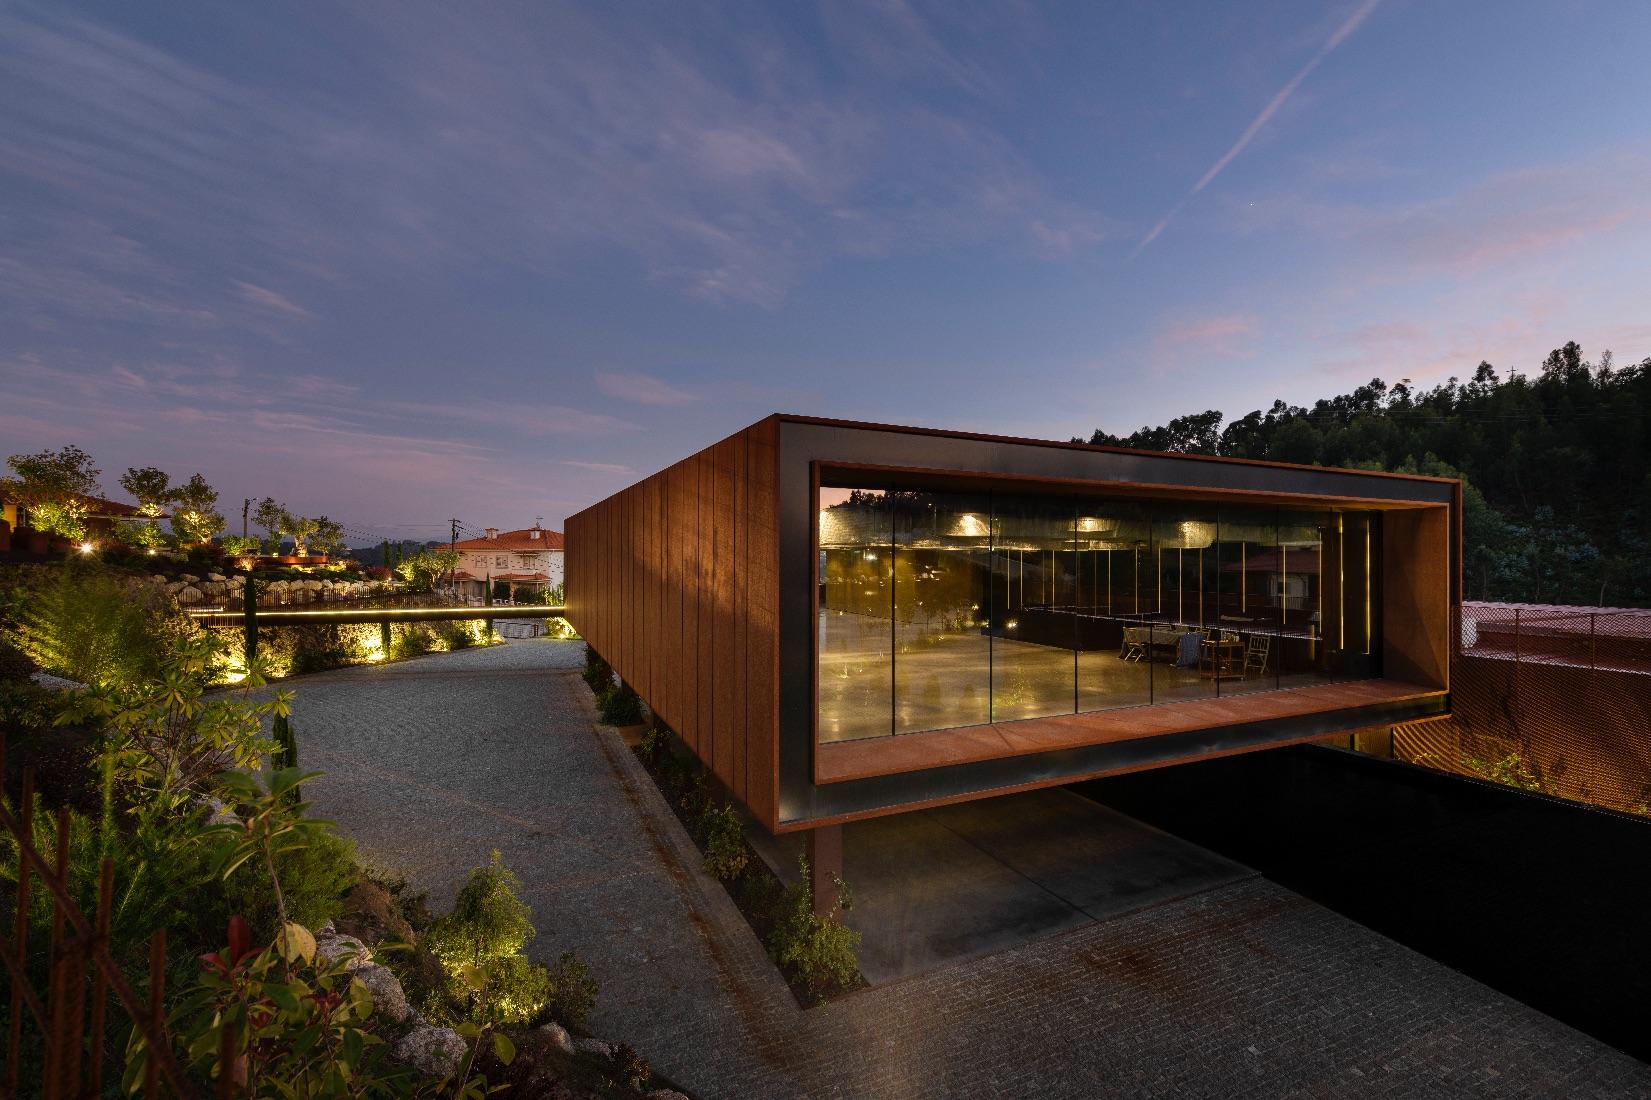 11_MMV Arquitectos_Suspended Matter Box_Inspirationist